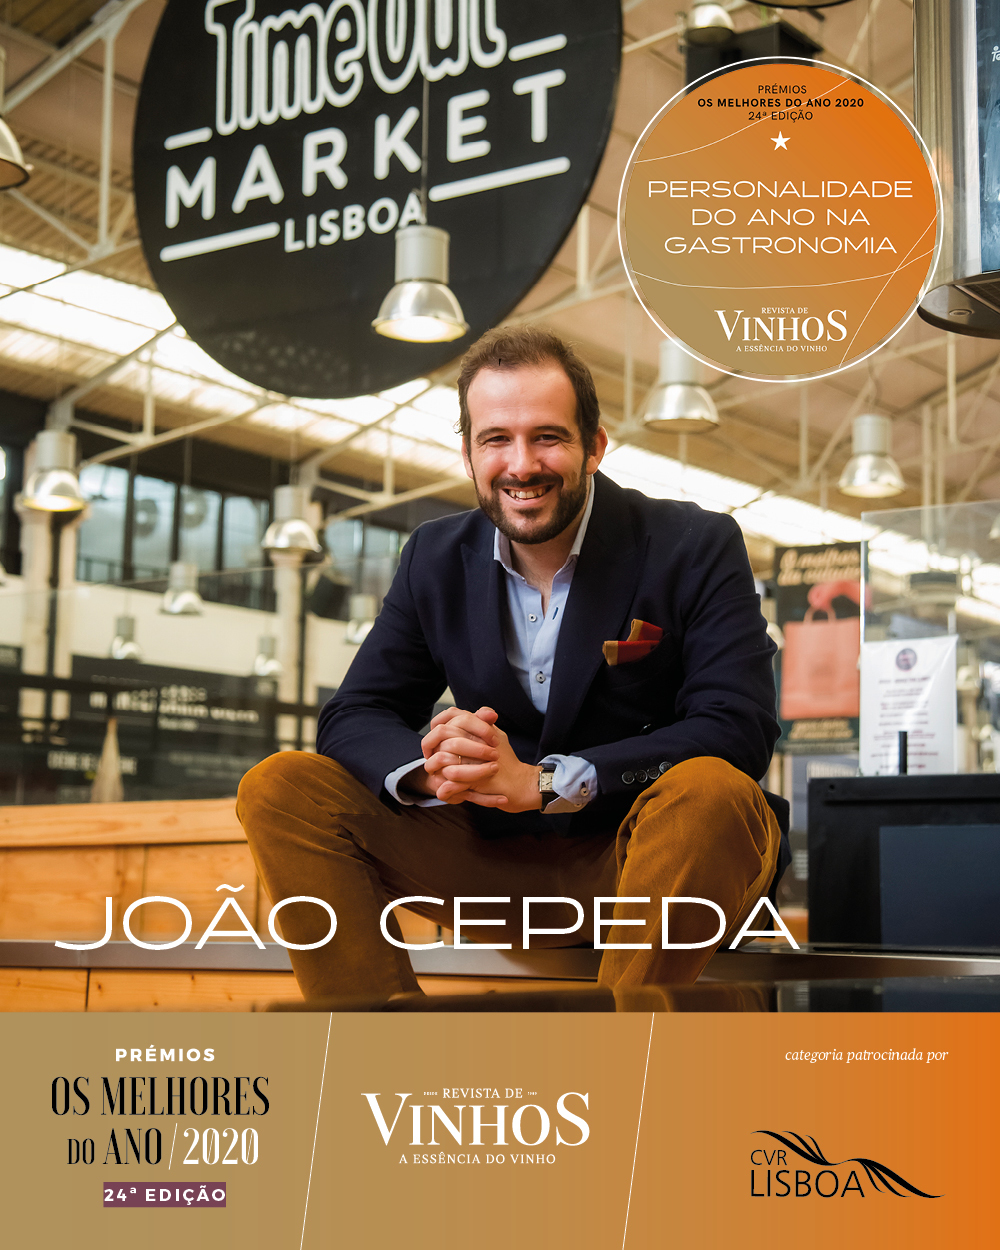 Joao Cepeda